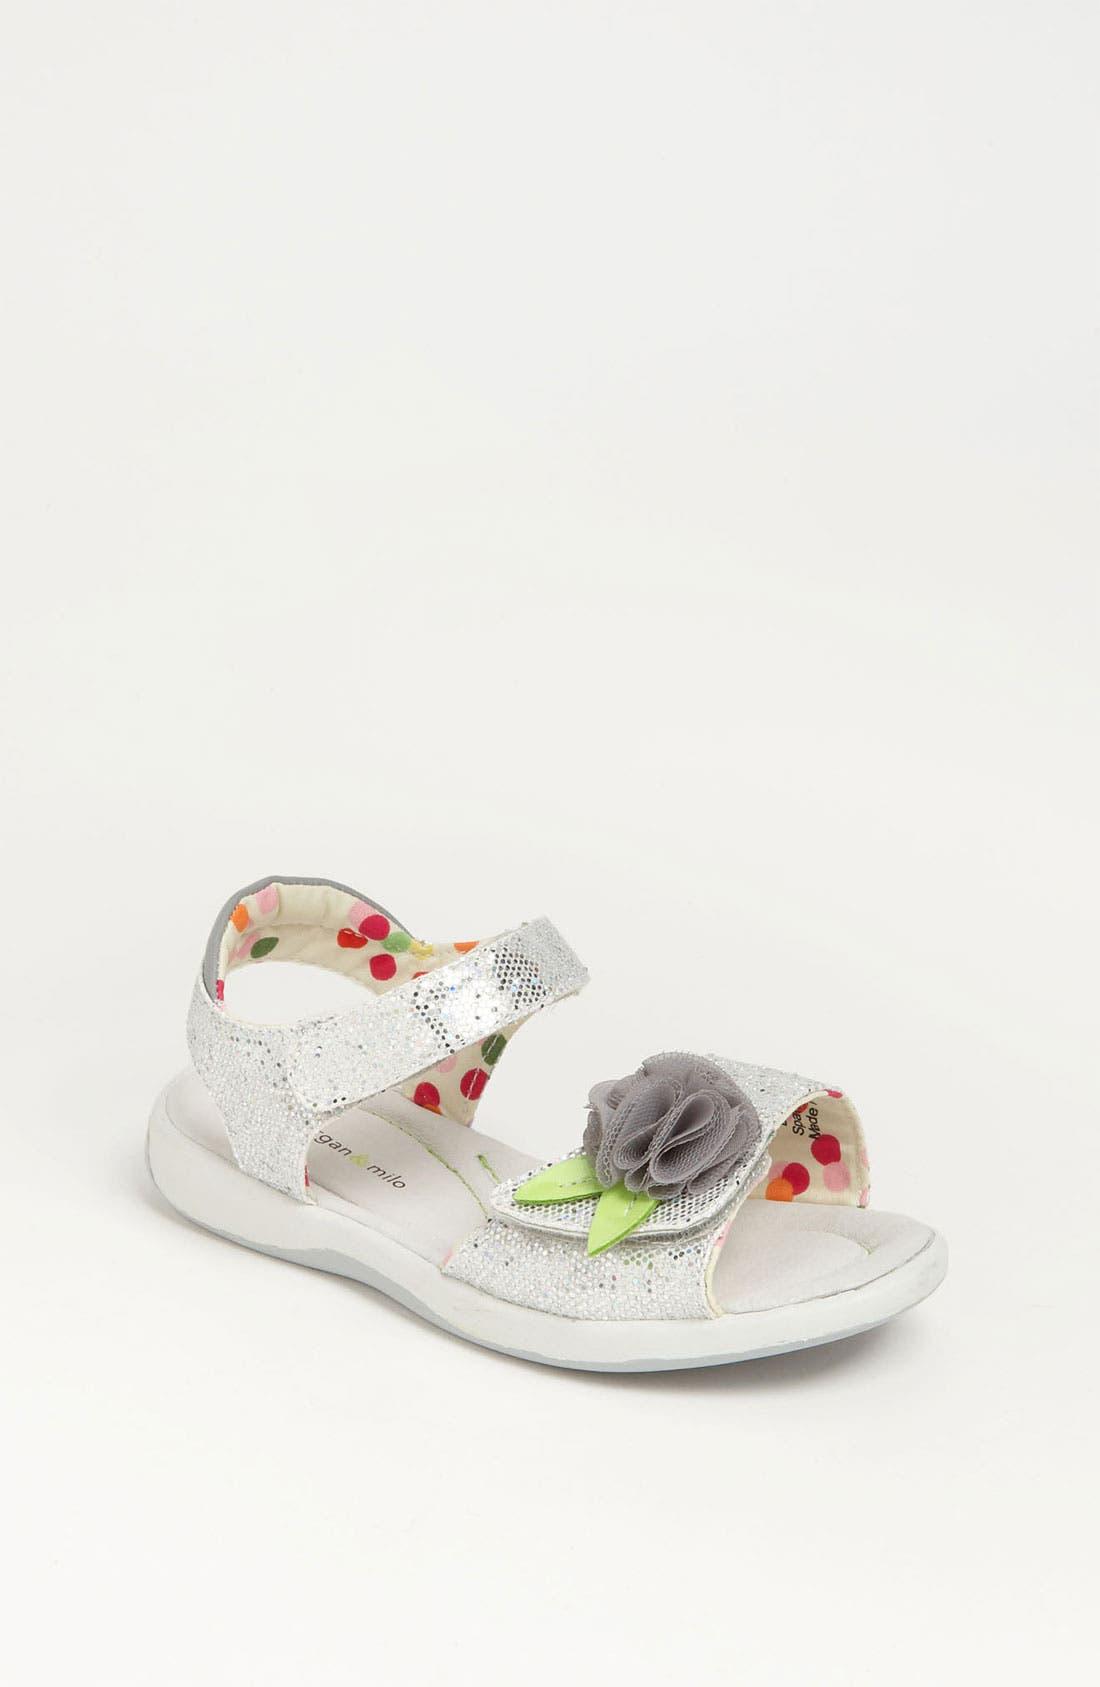 Main Image - Morgan & Milo 'Tina' Sparkle Sandal (Walker, Toddler & Little Kid)